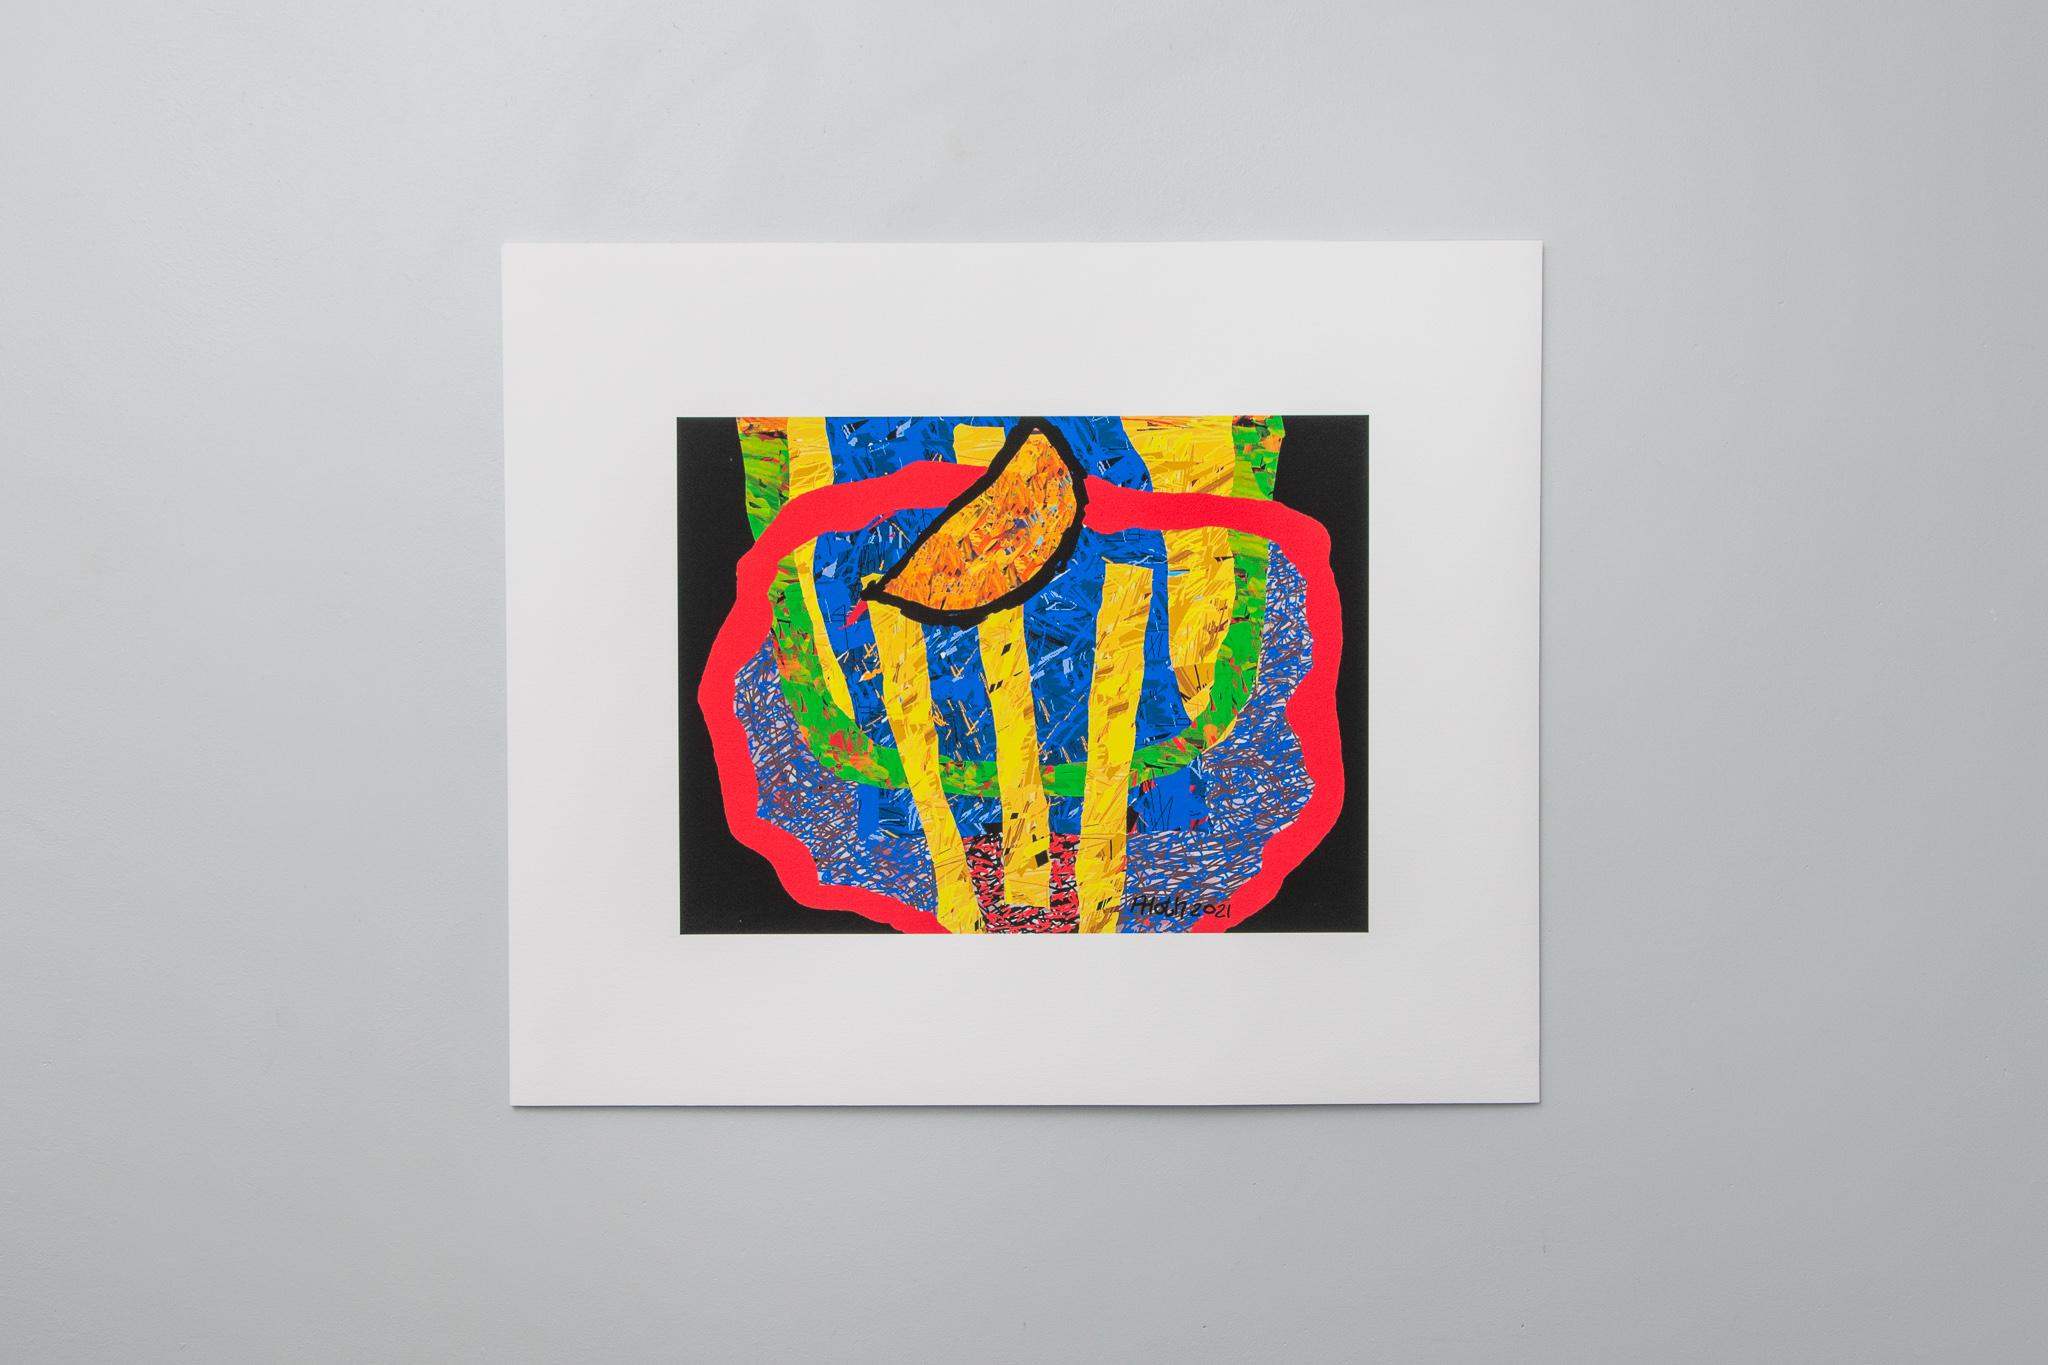 Black Moon Rising, Arno Hoth, digital print on fine art paper